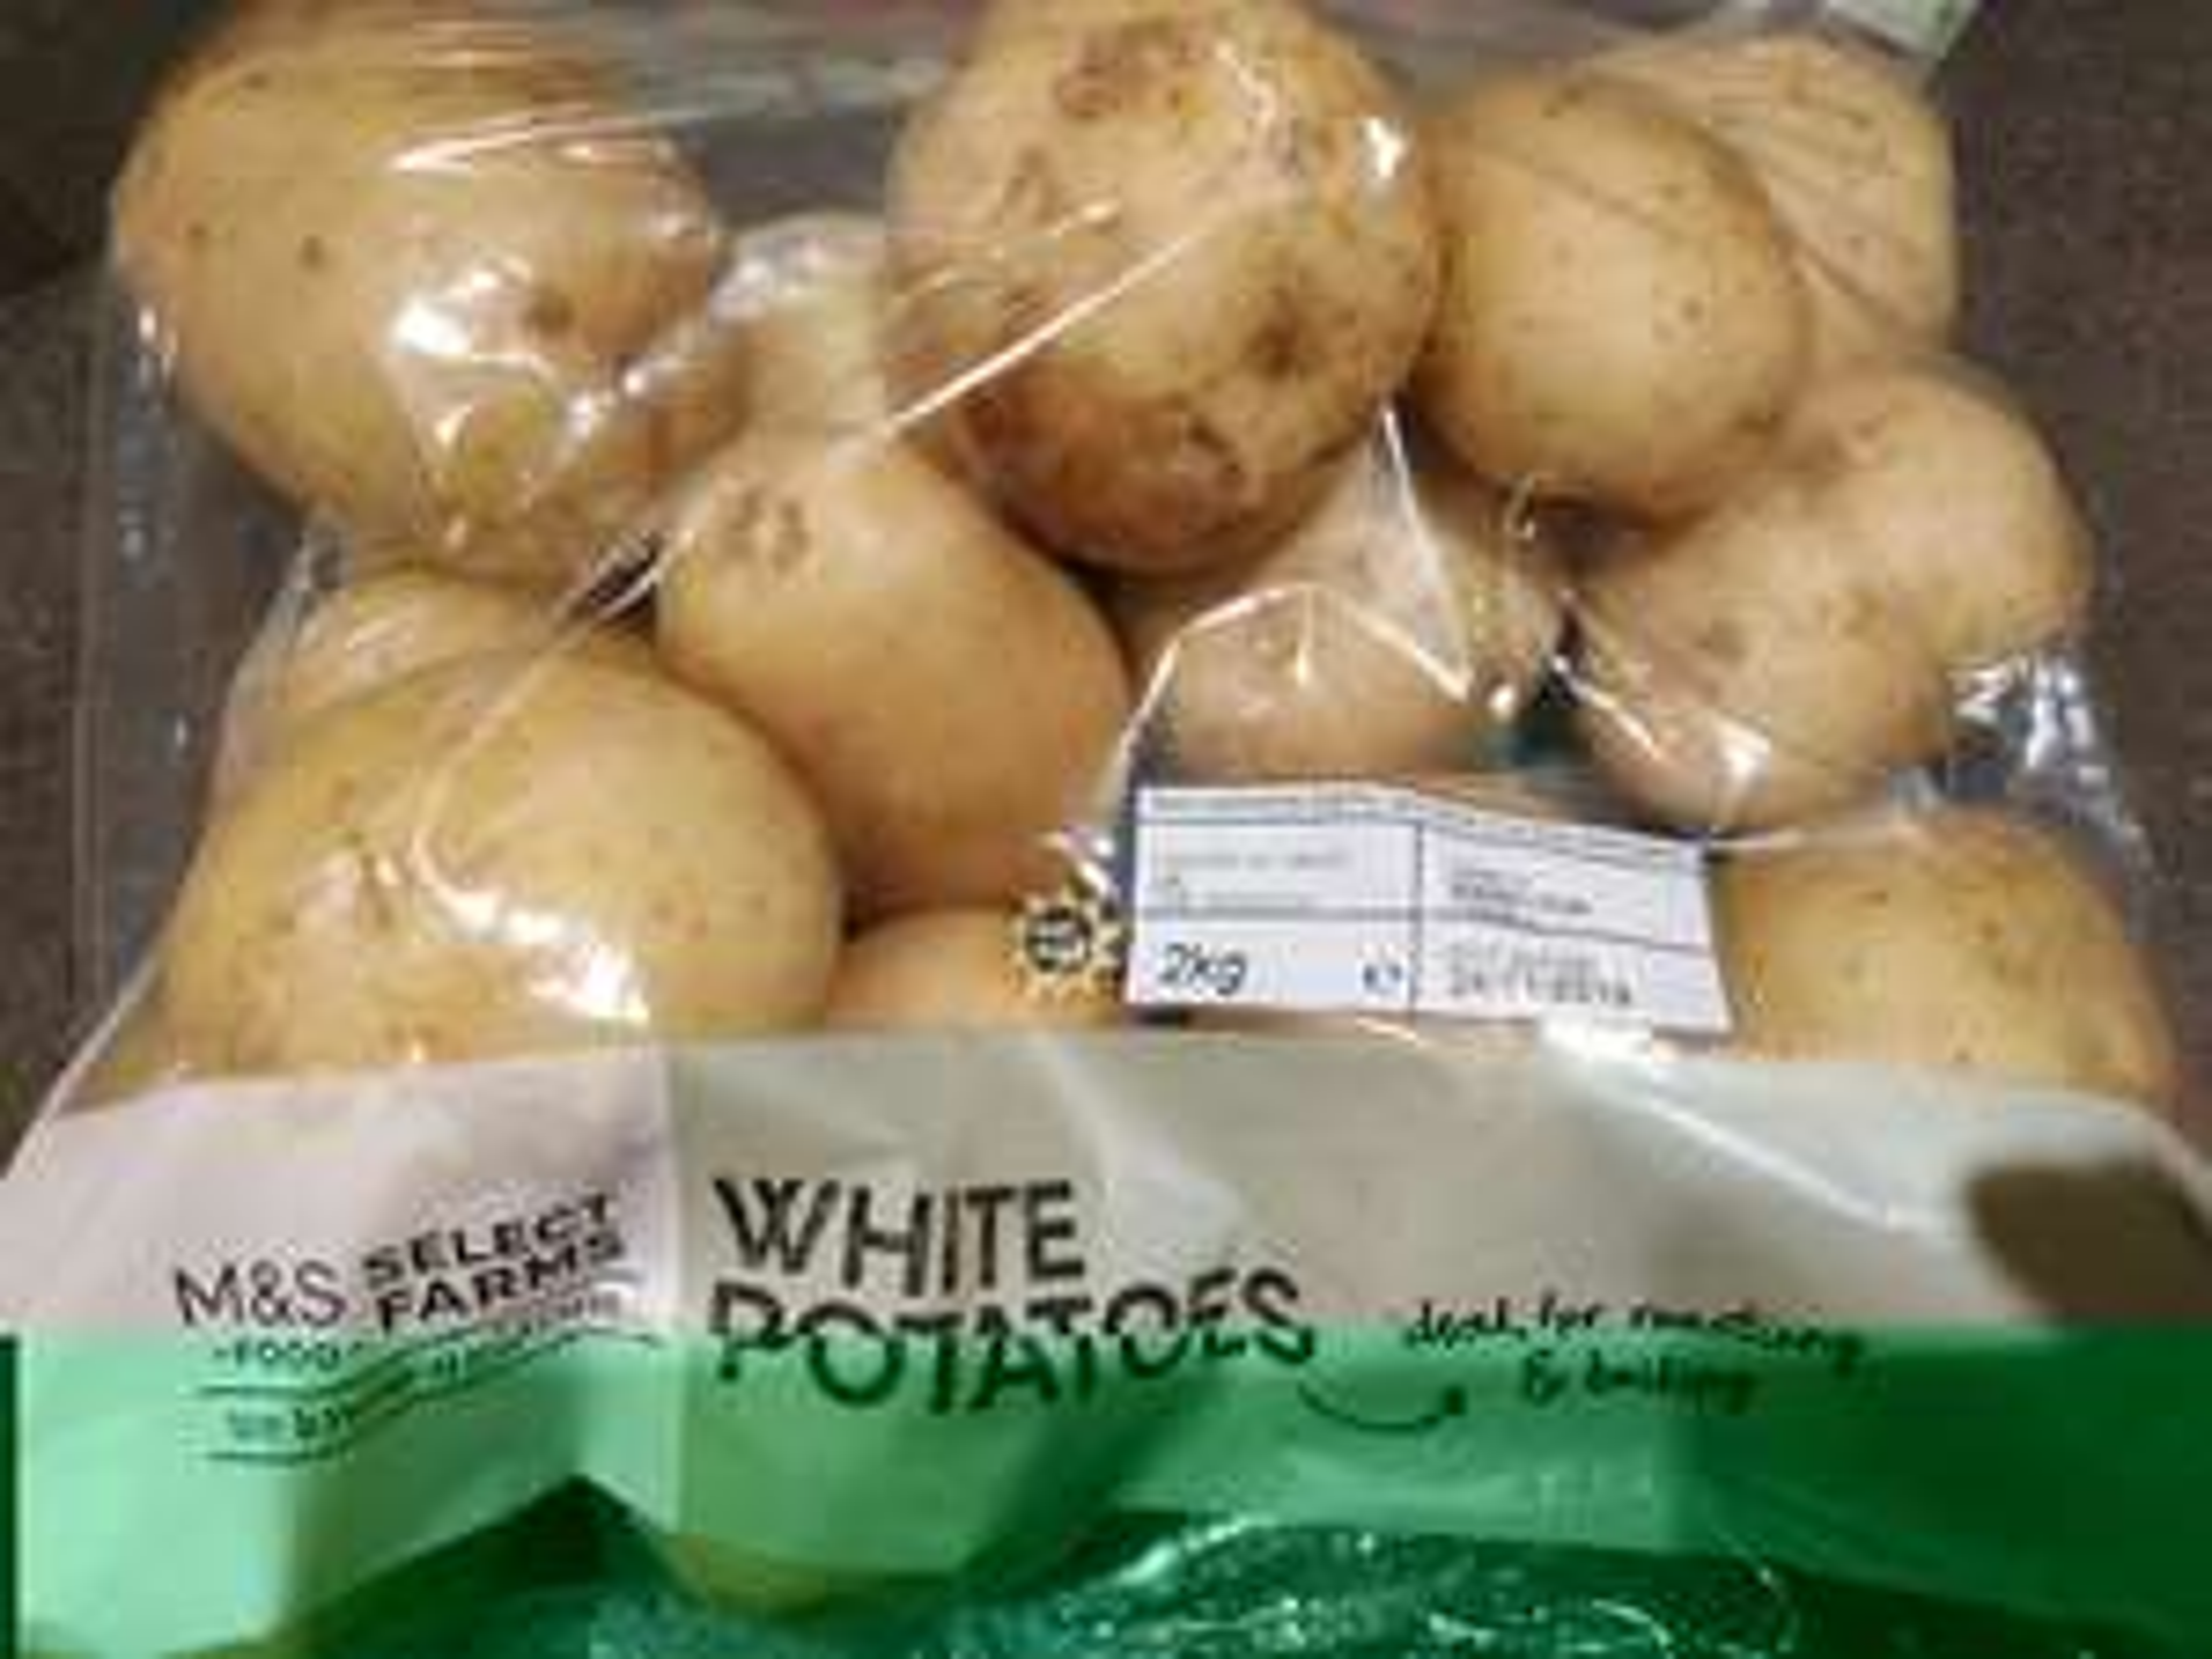 2 kgs white potatoes 0.65 fresh deals M&S Archway